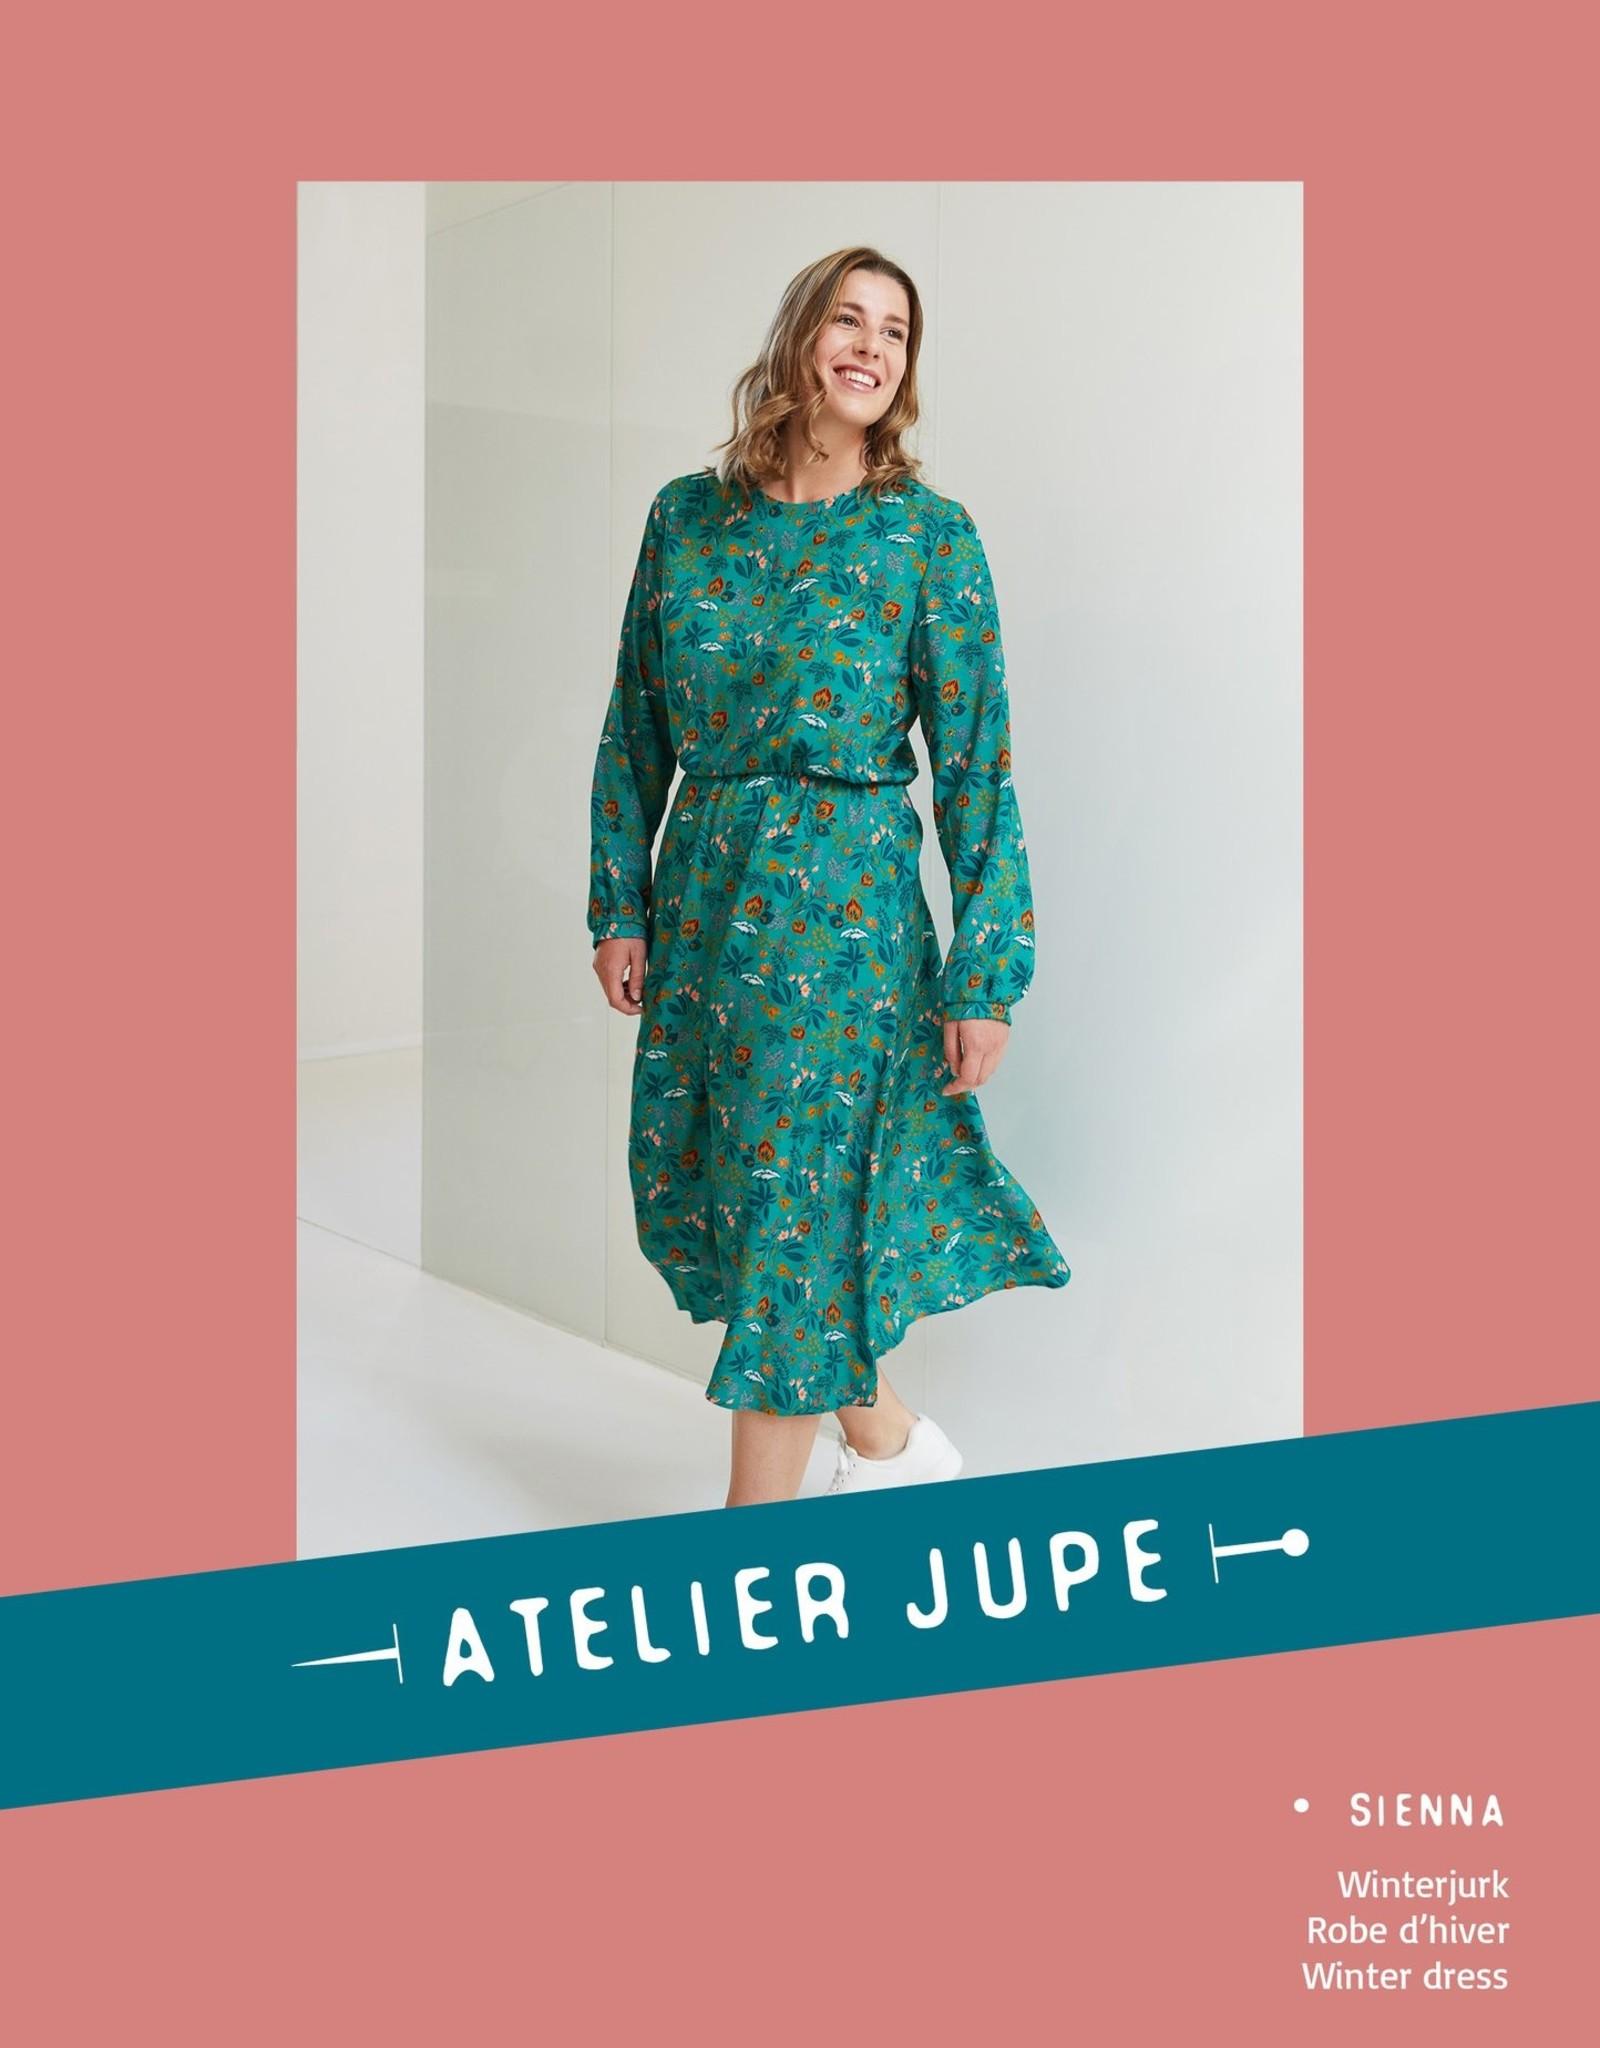 Atelier Jupe Sienna winterjurk - Atelier Jupe